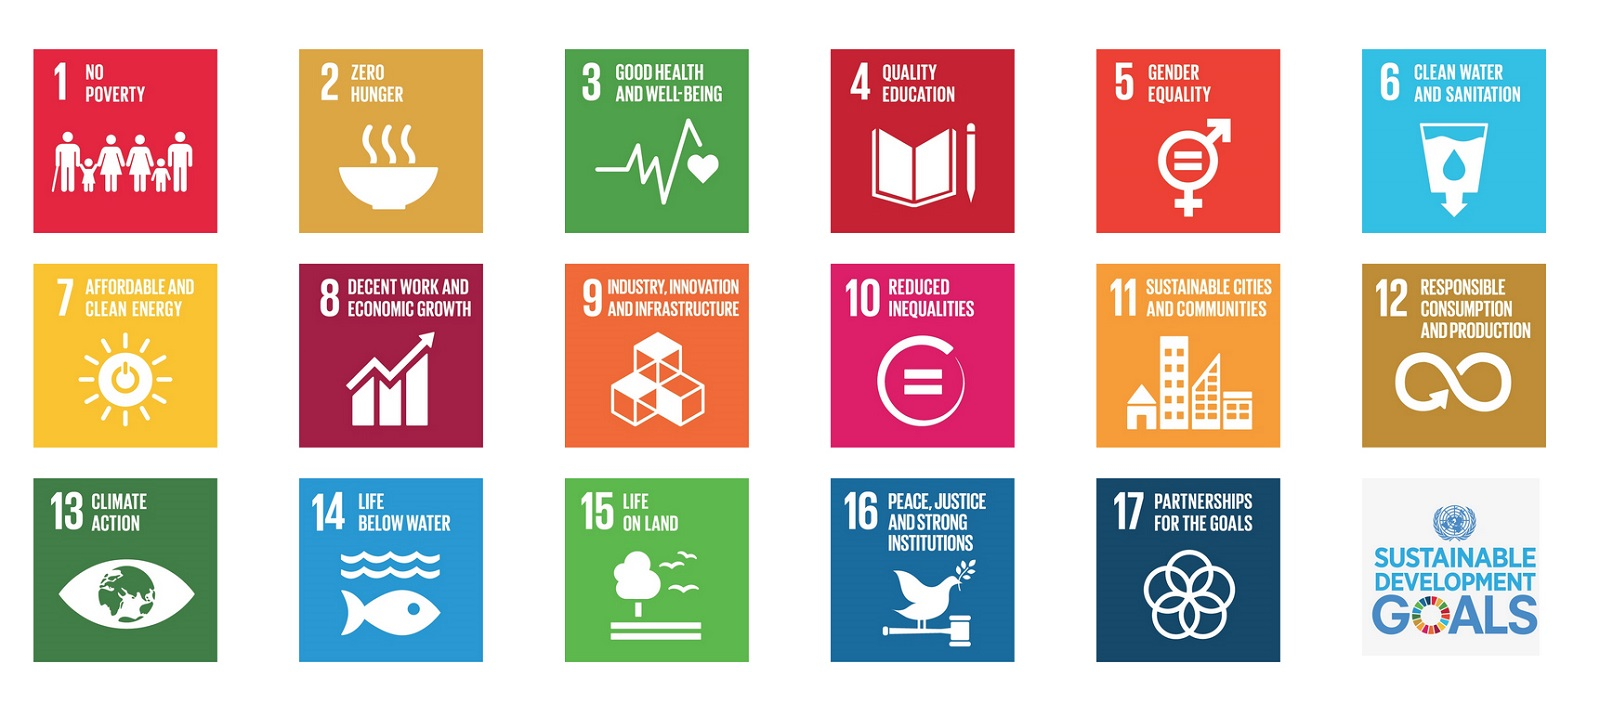 Sustainability-Development-Goals